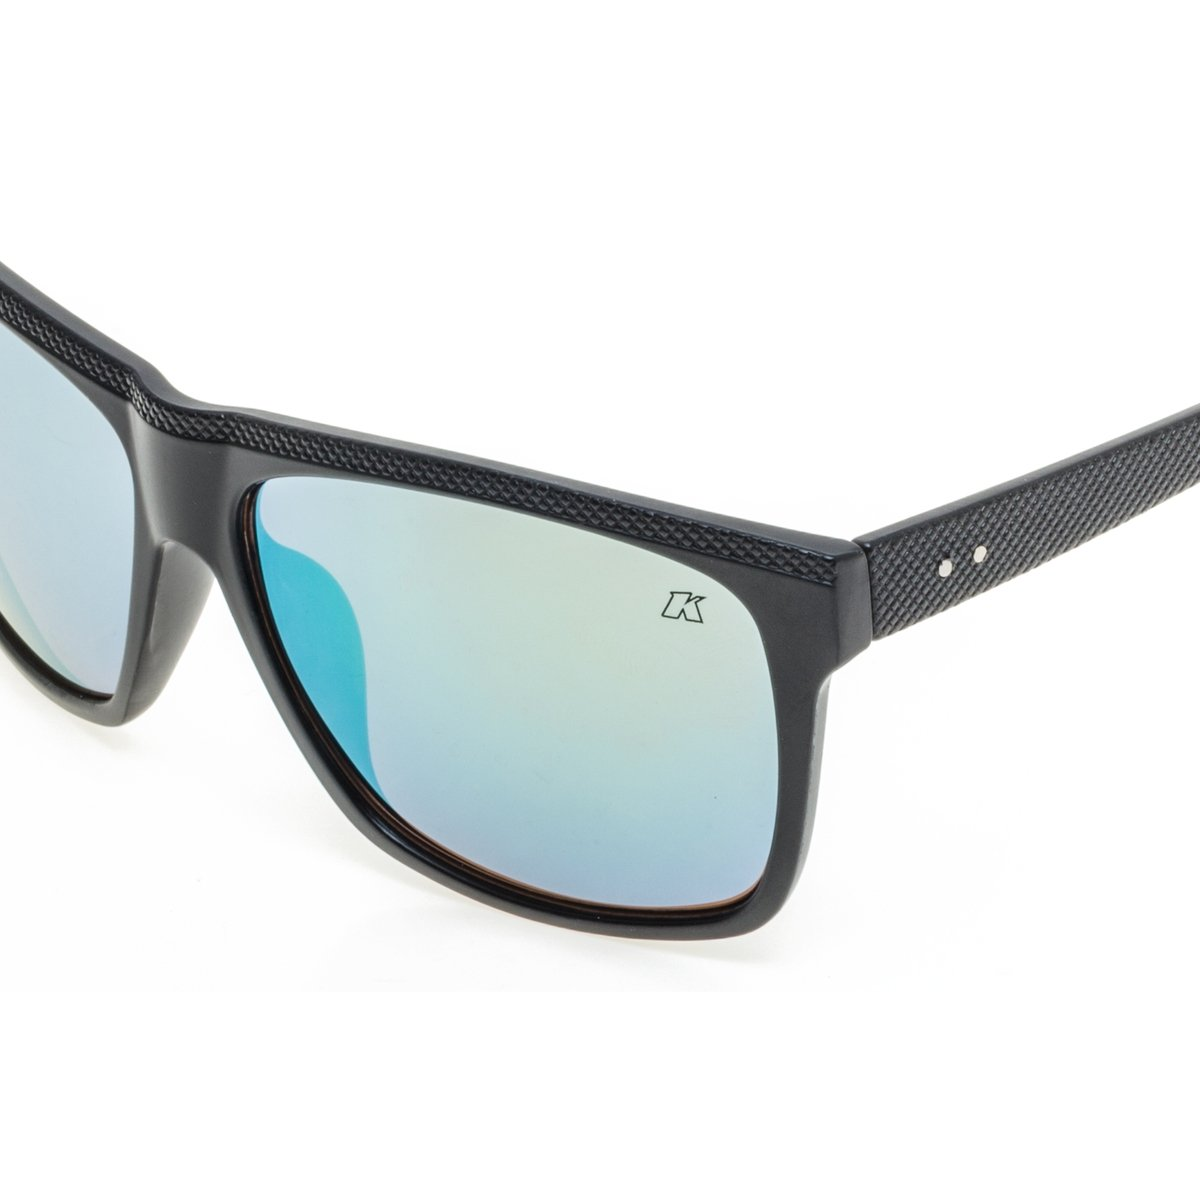 179d33a534b68 Óculos de Sol Khatto 540913 - Compre Agora   Netshoes